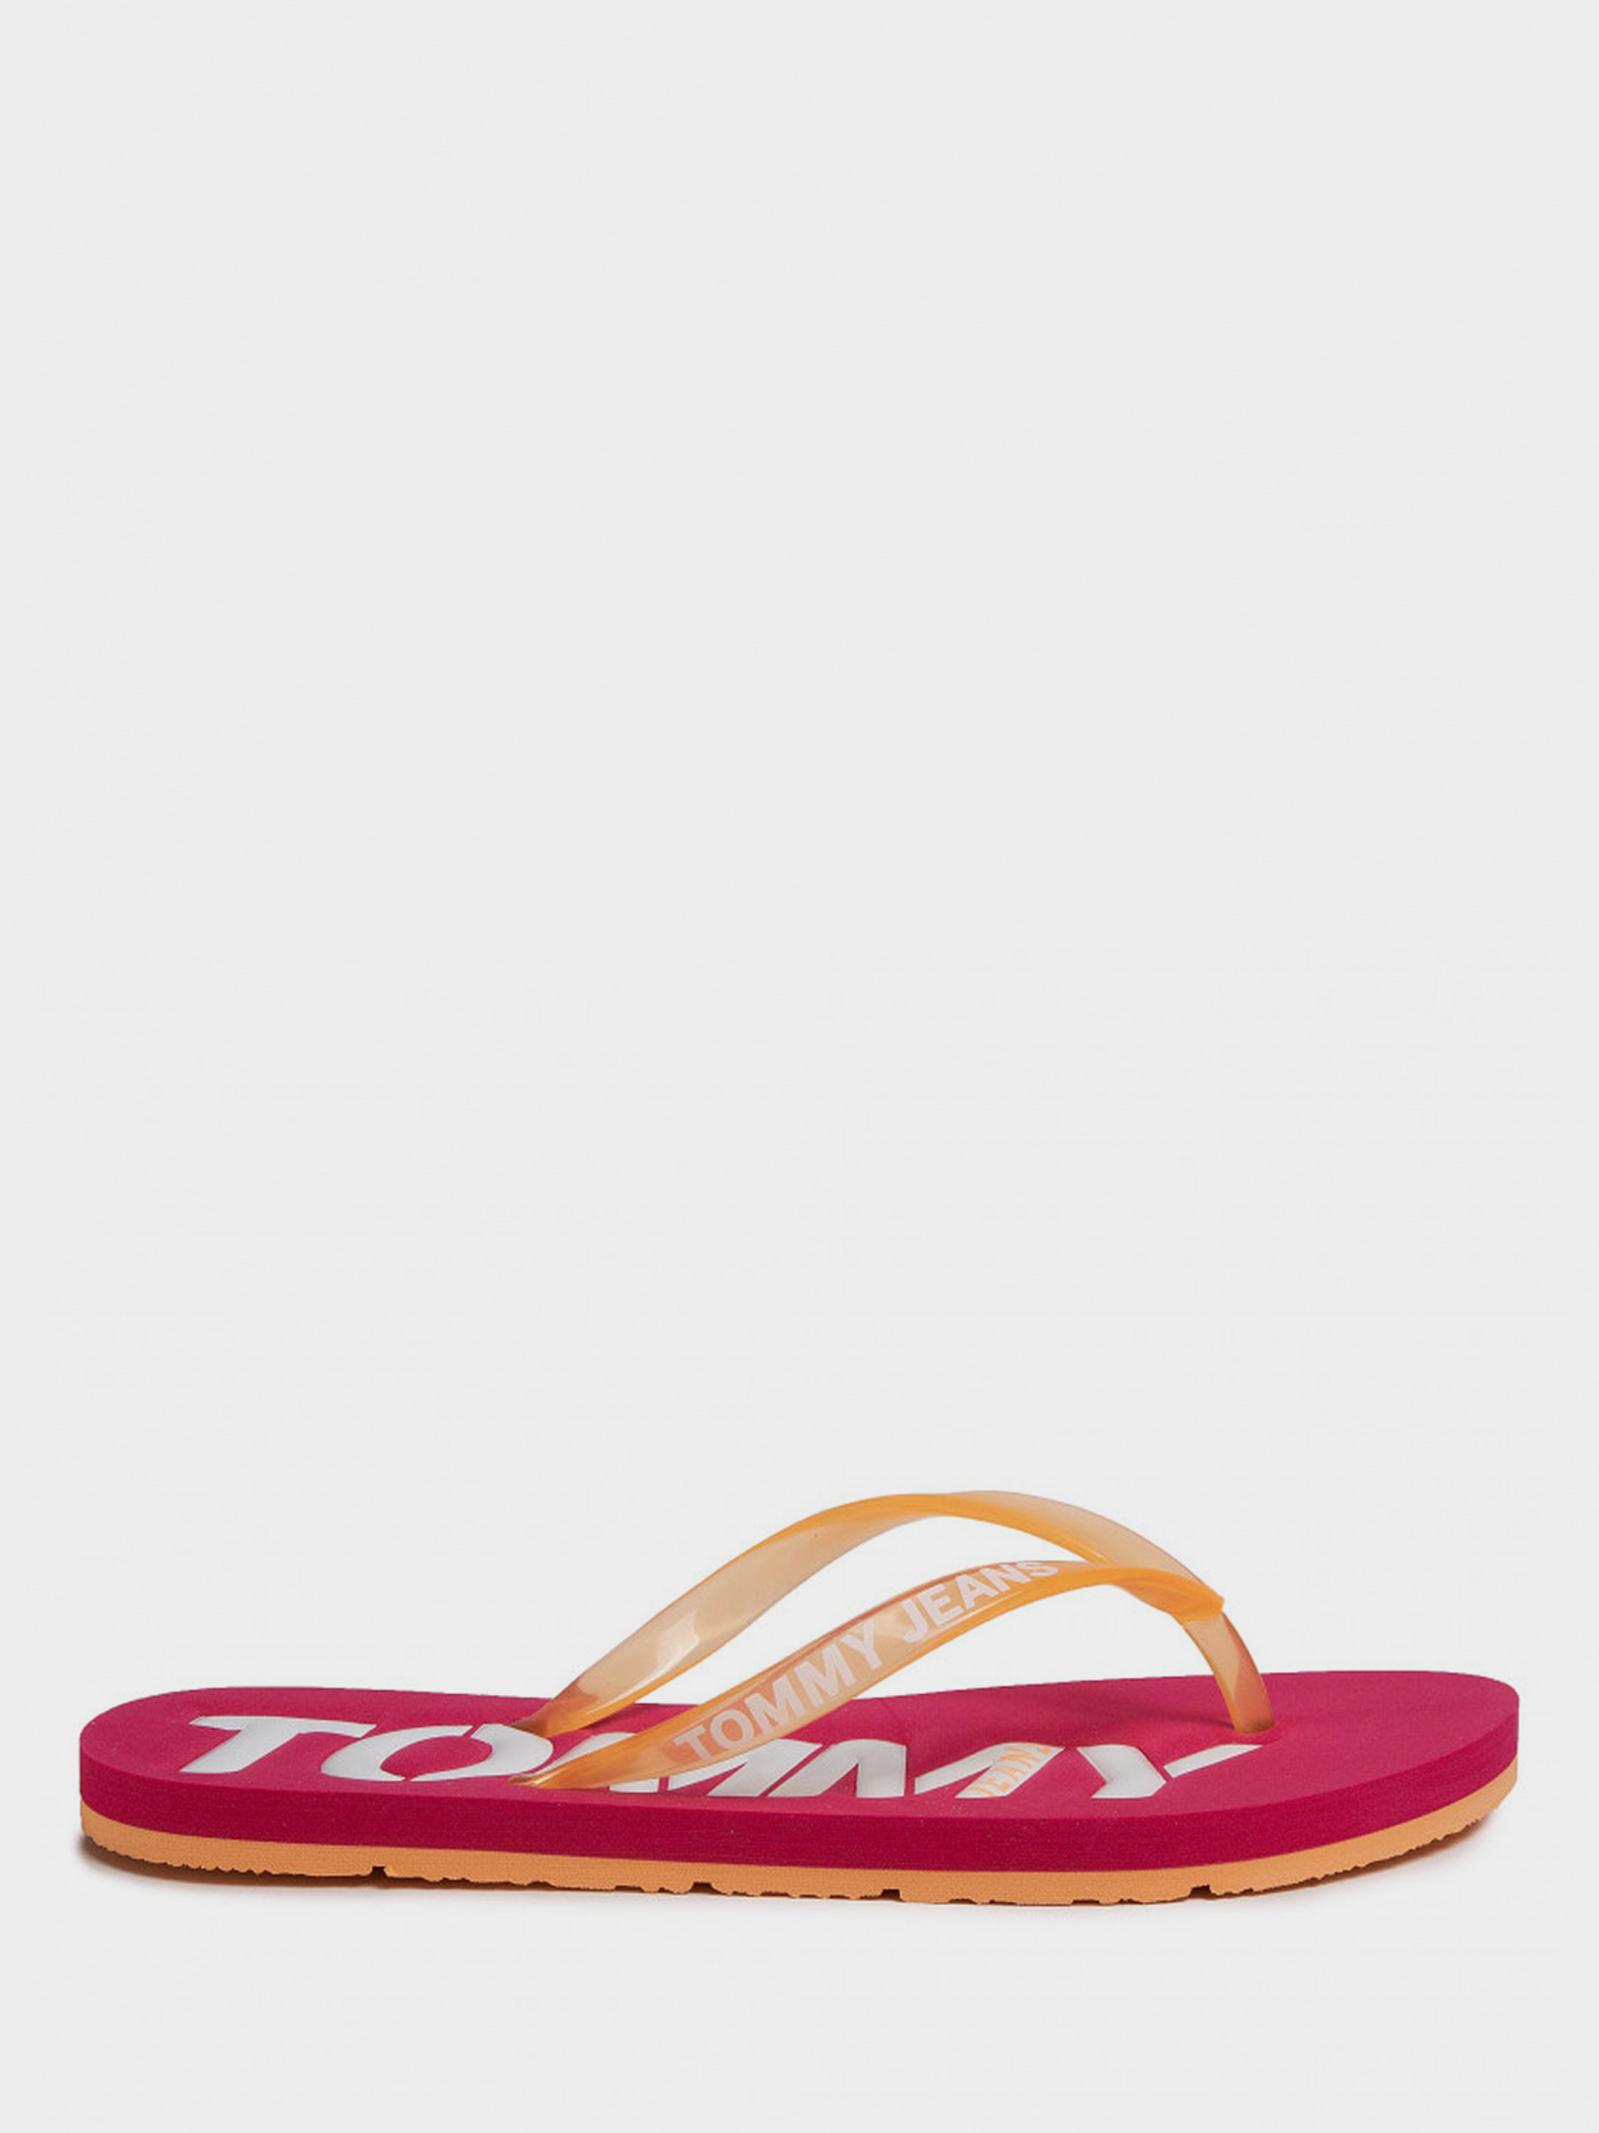 Шльопанці  для жінок Tommy Hilfiger EN0EN00849-XIF фото, купити, 2017